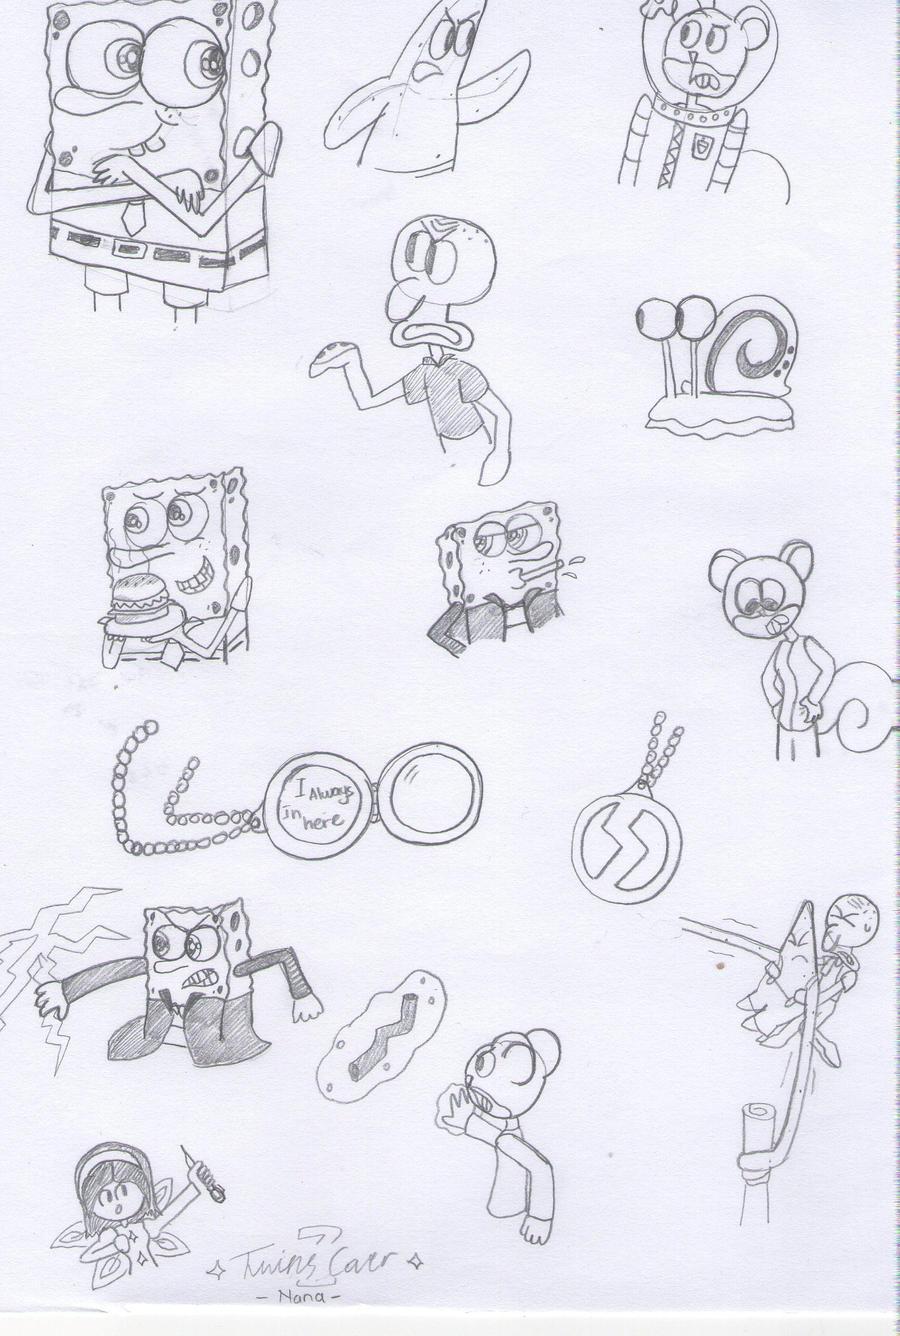 Uncategorized Sketch Of Spongebob sketch spongebob and friend by twinscover on deviantart twinscover